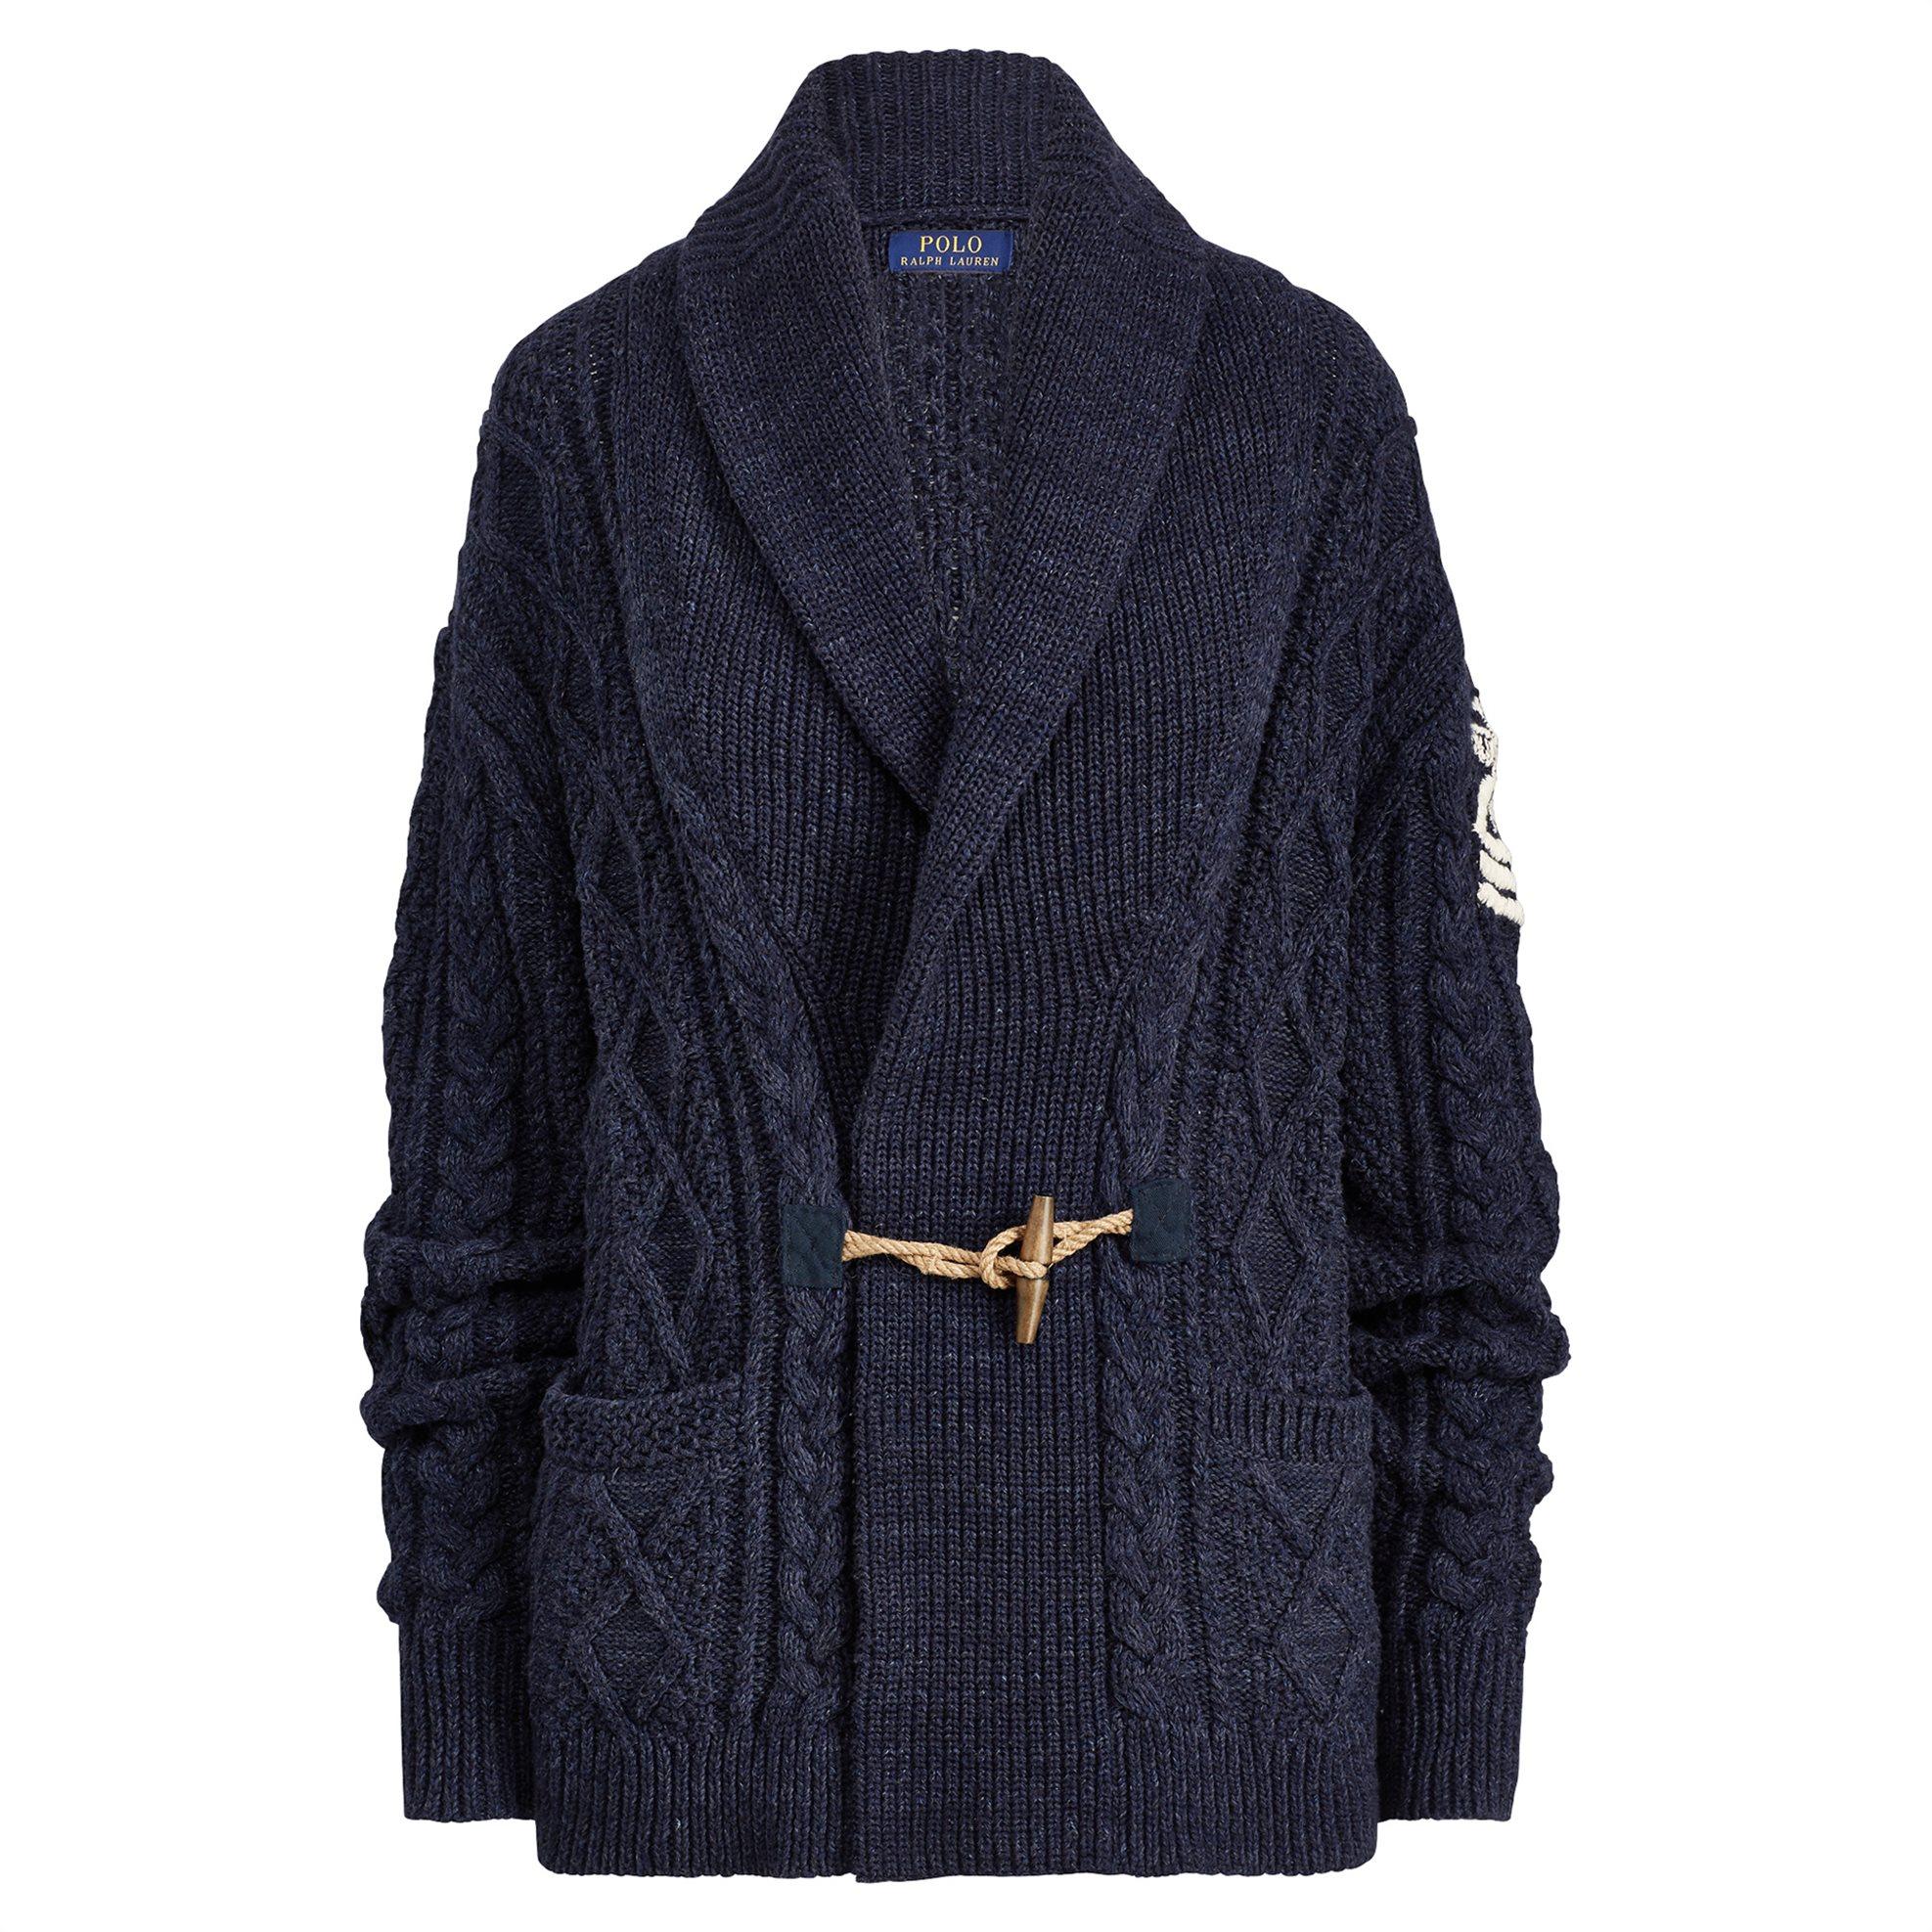 Polo Ralph Lauren γυναικεία ζακέτα πλεκτή Embroidered Shawl Cardigan Νavy - 2117 γυναικα   ρουχα   πλεκτά   ζακέτες